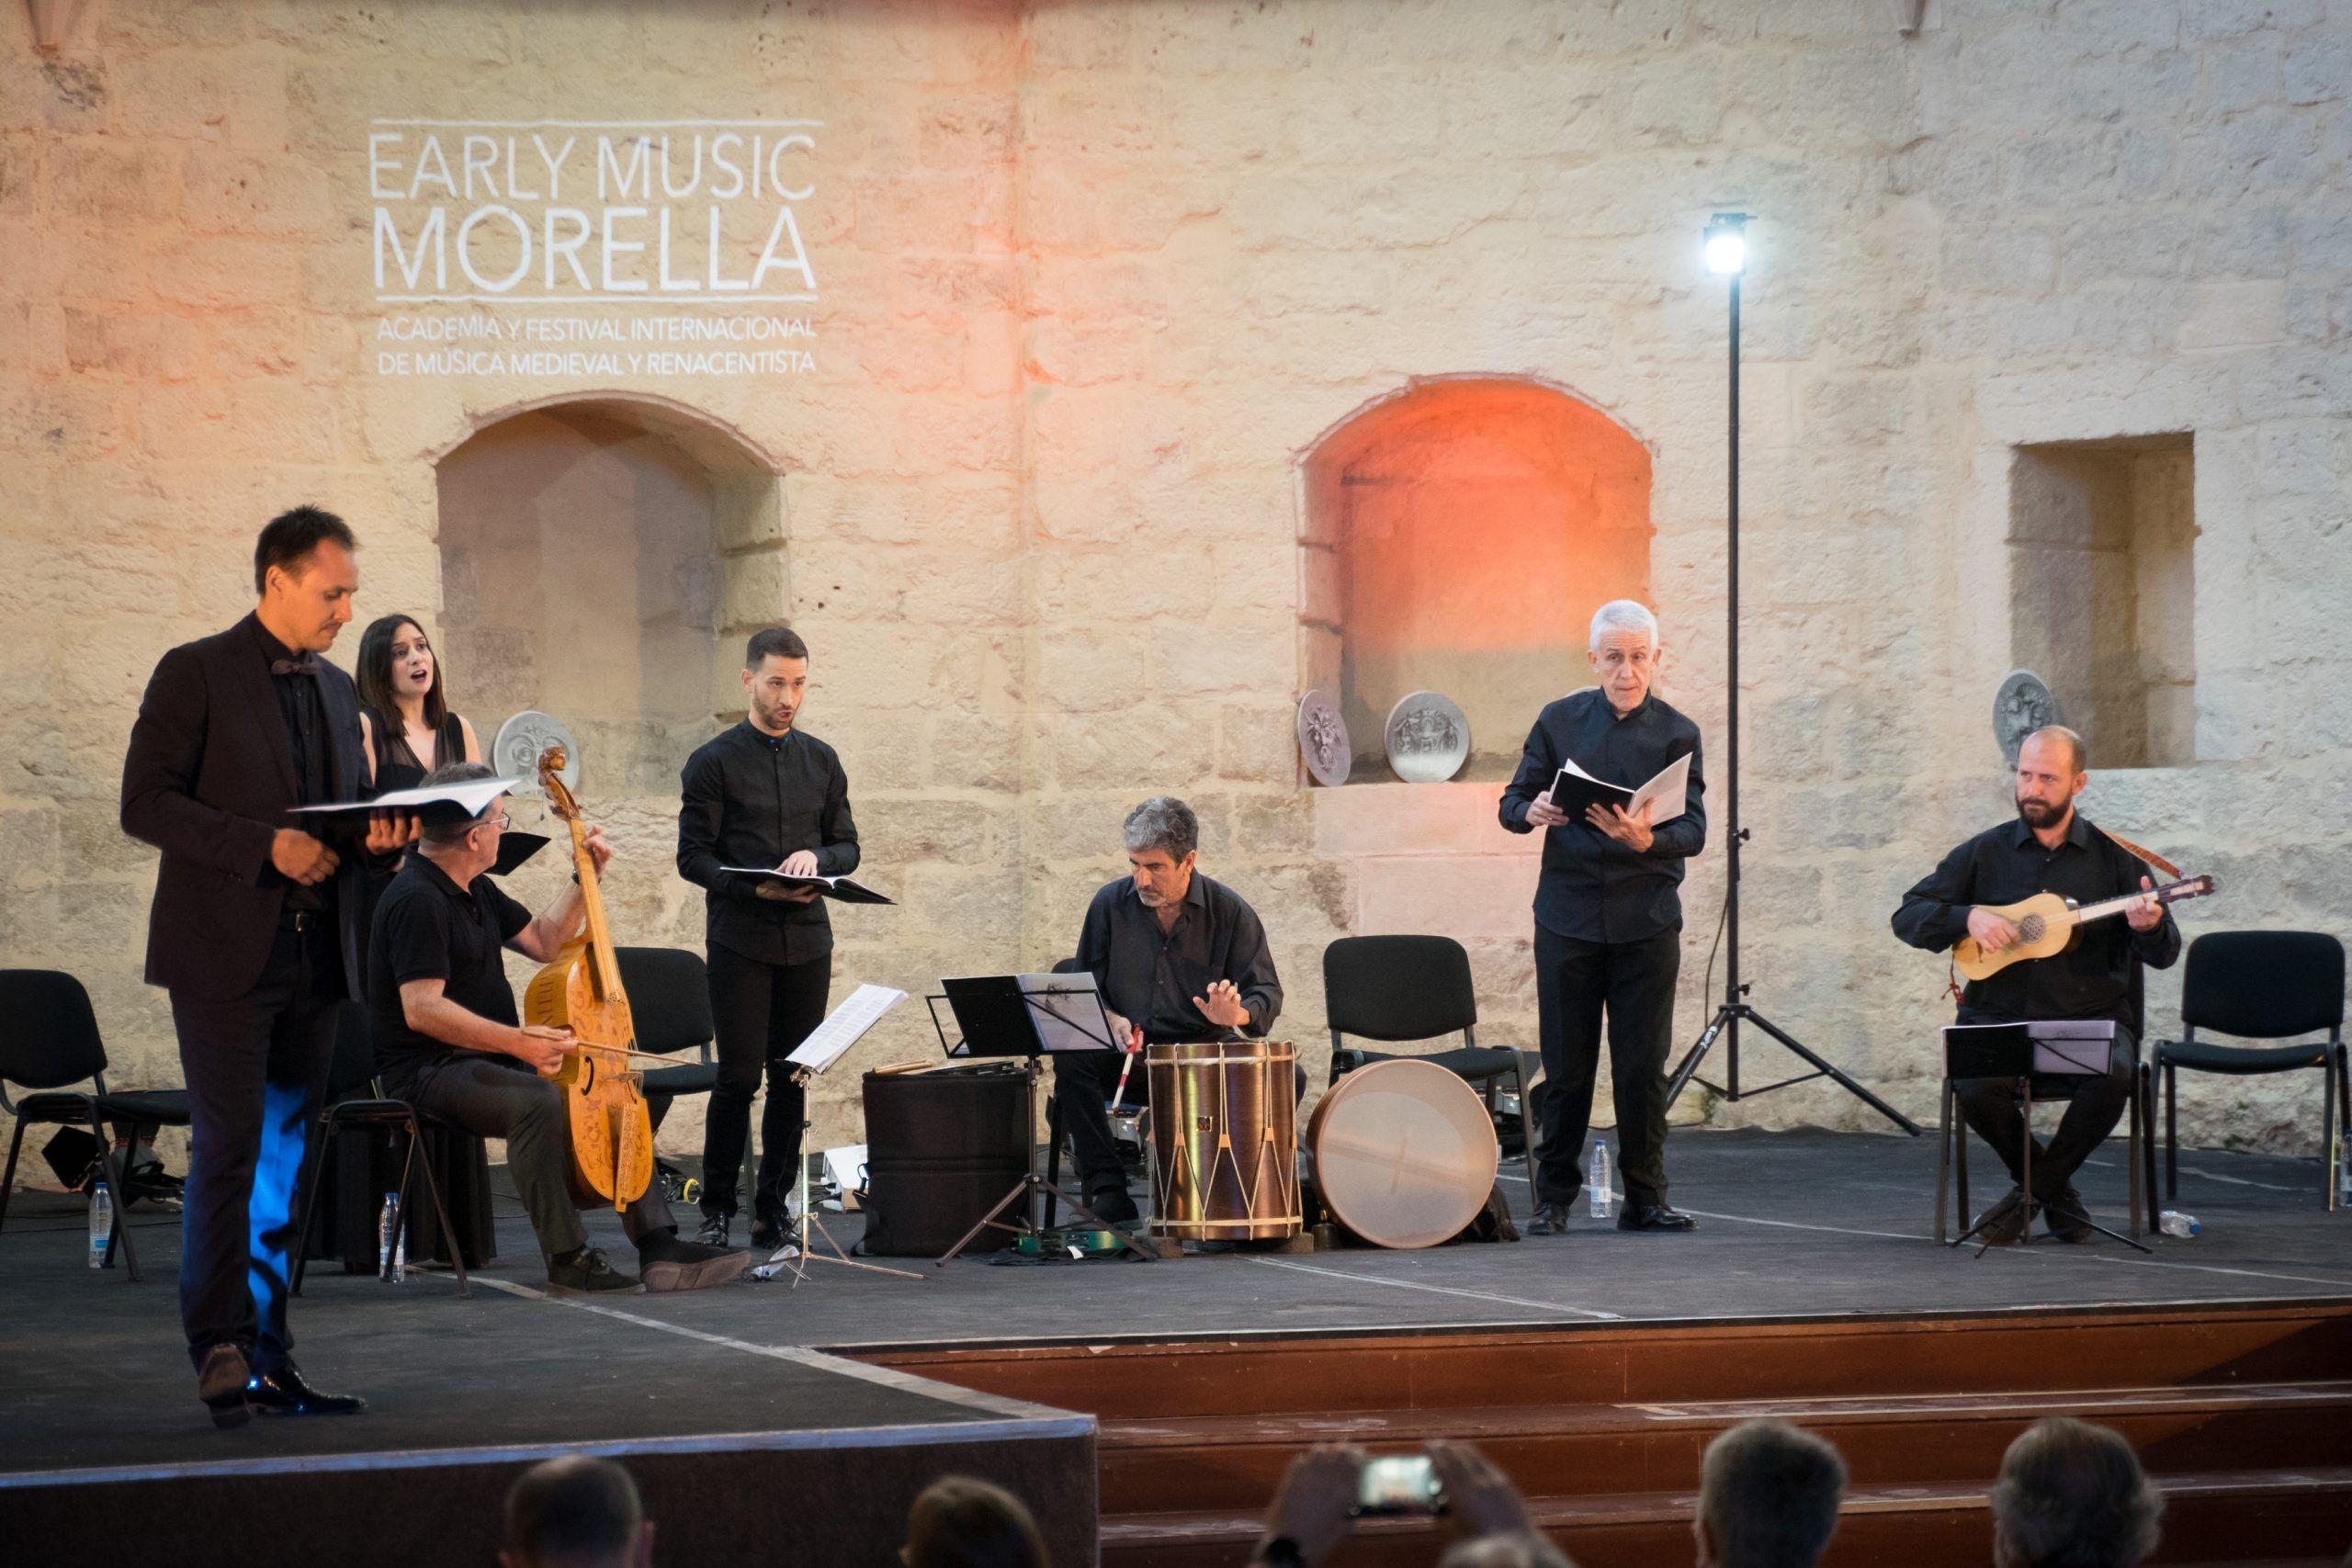 Early Music Morella ofrecerá actividades este puente de diciembre